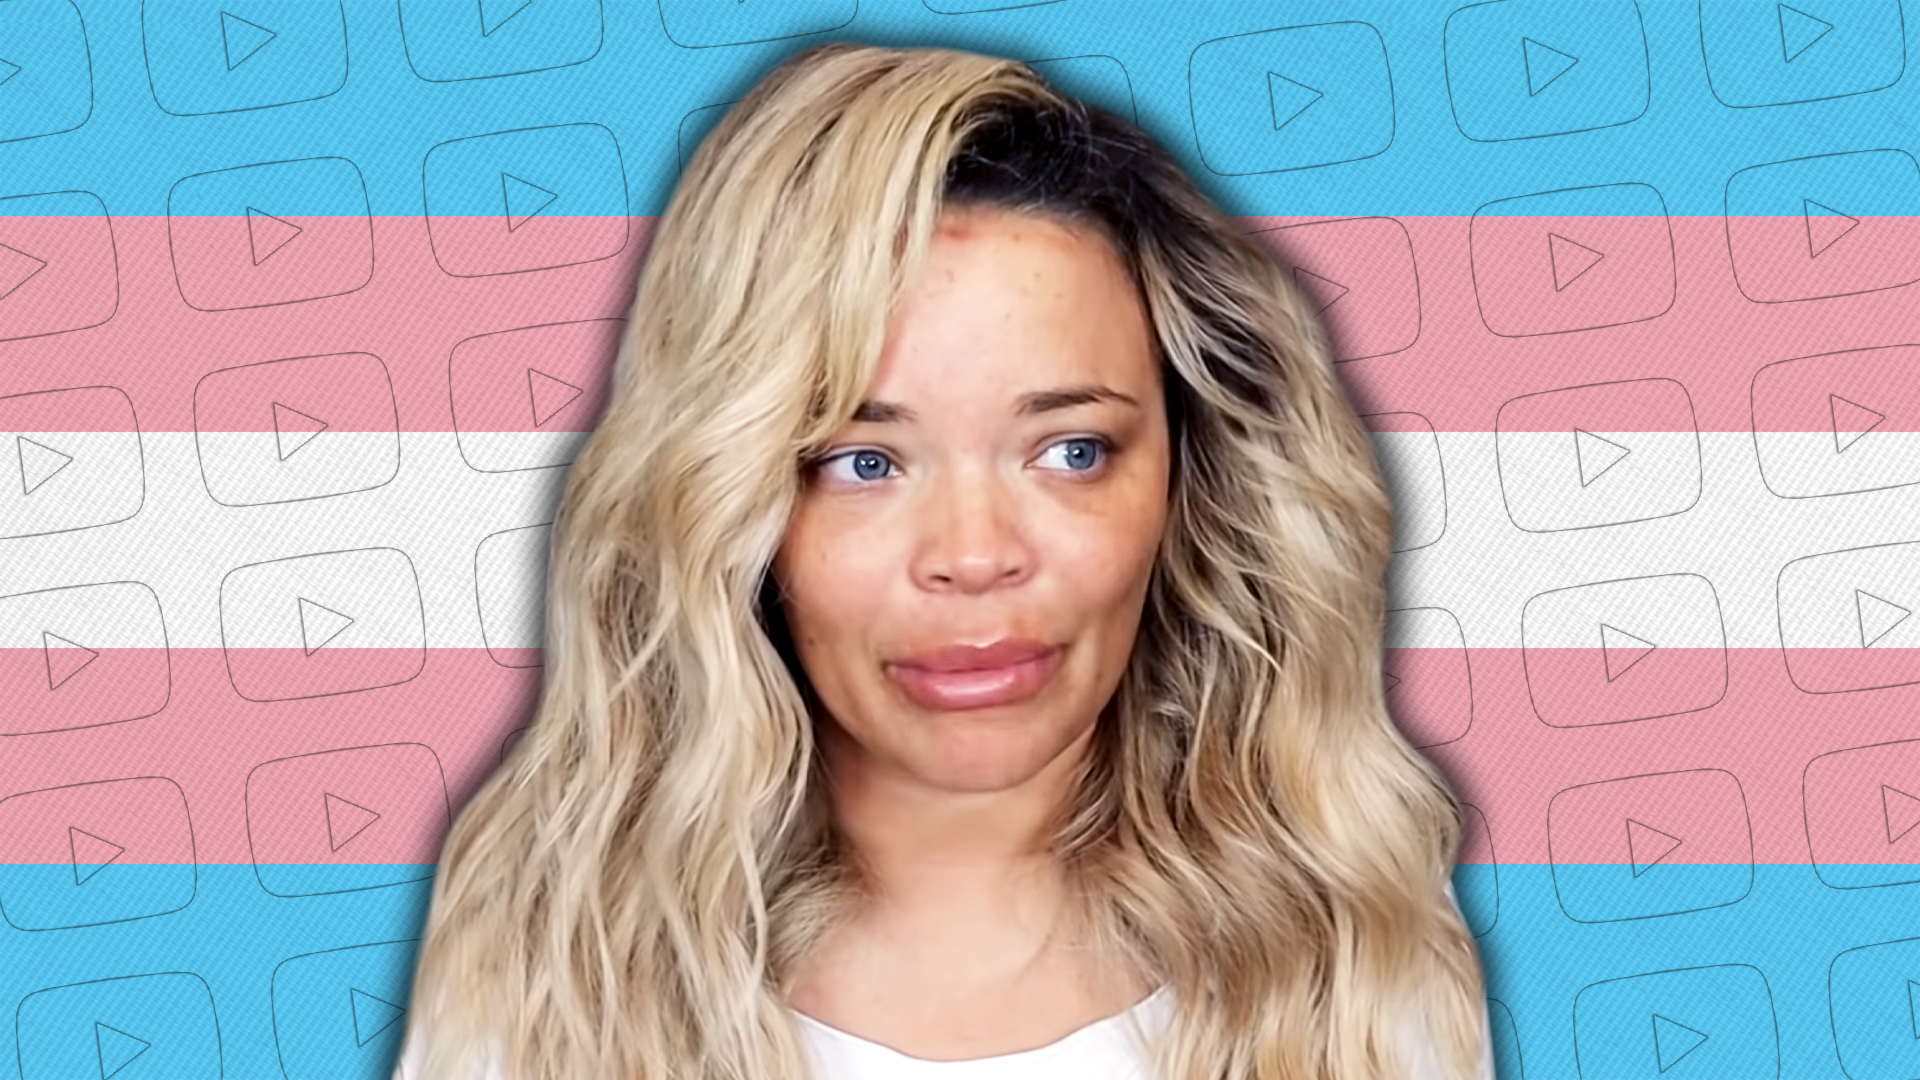 Trisha Paytas Accused of Exploiting Transgender Community